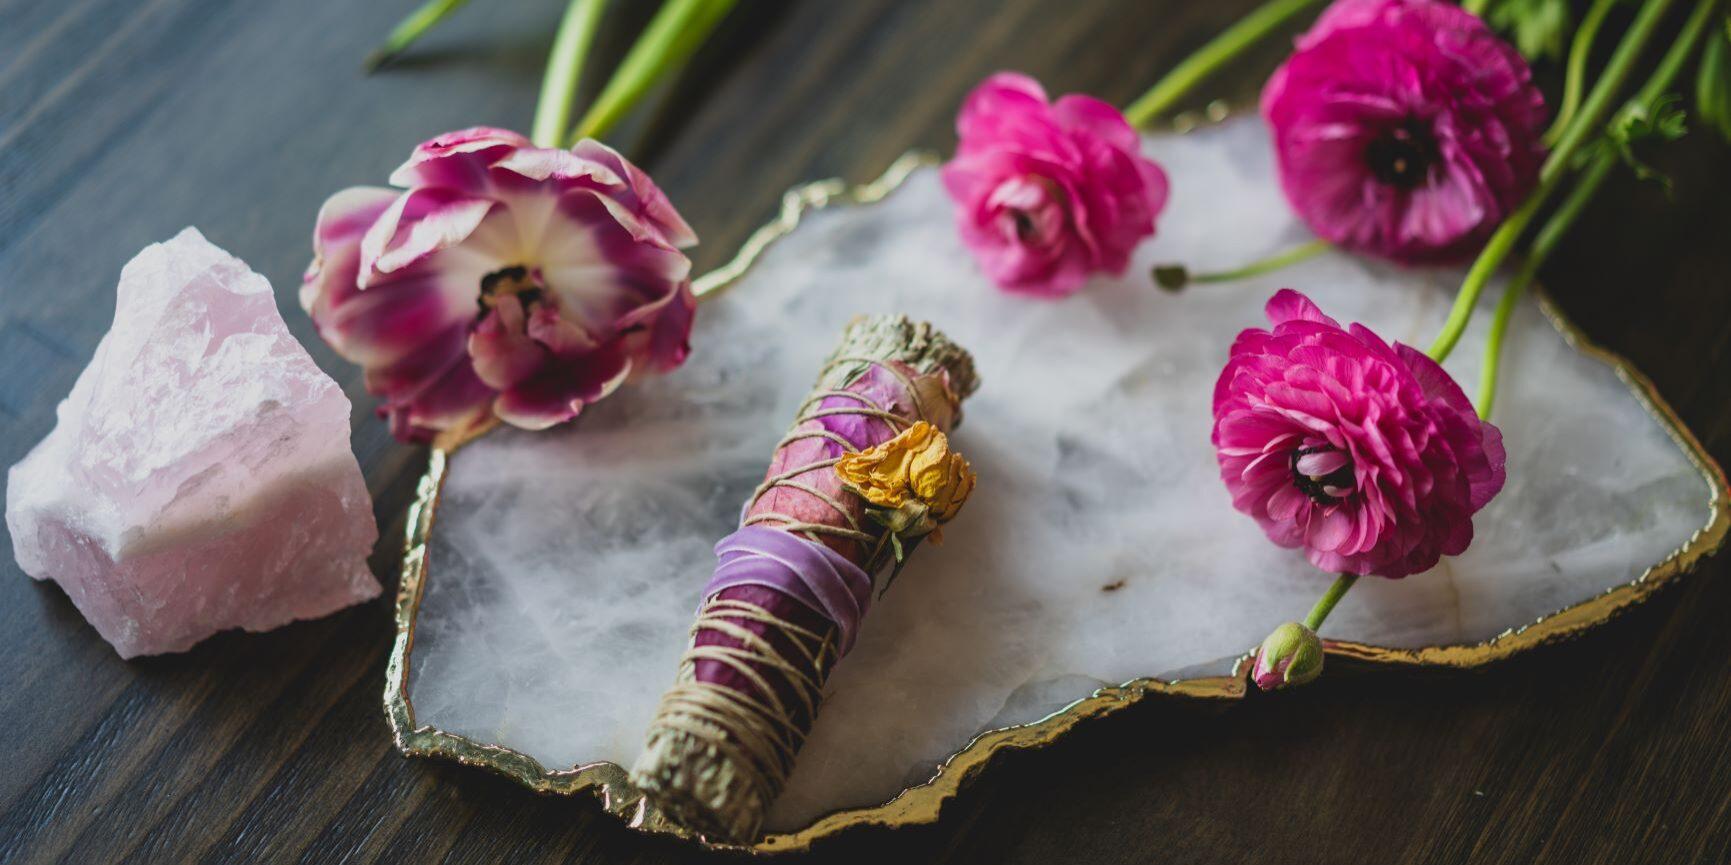 flower-still-life-rose-floral-crystal-quartz-sage-rose-quartz-palo-santo-sage-stick_t20_ZxzXdj_compressed